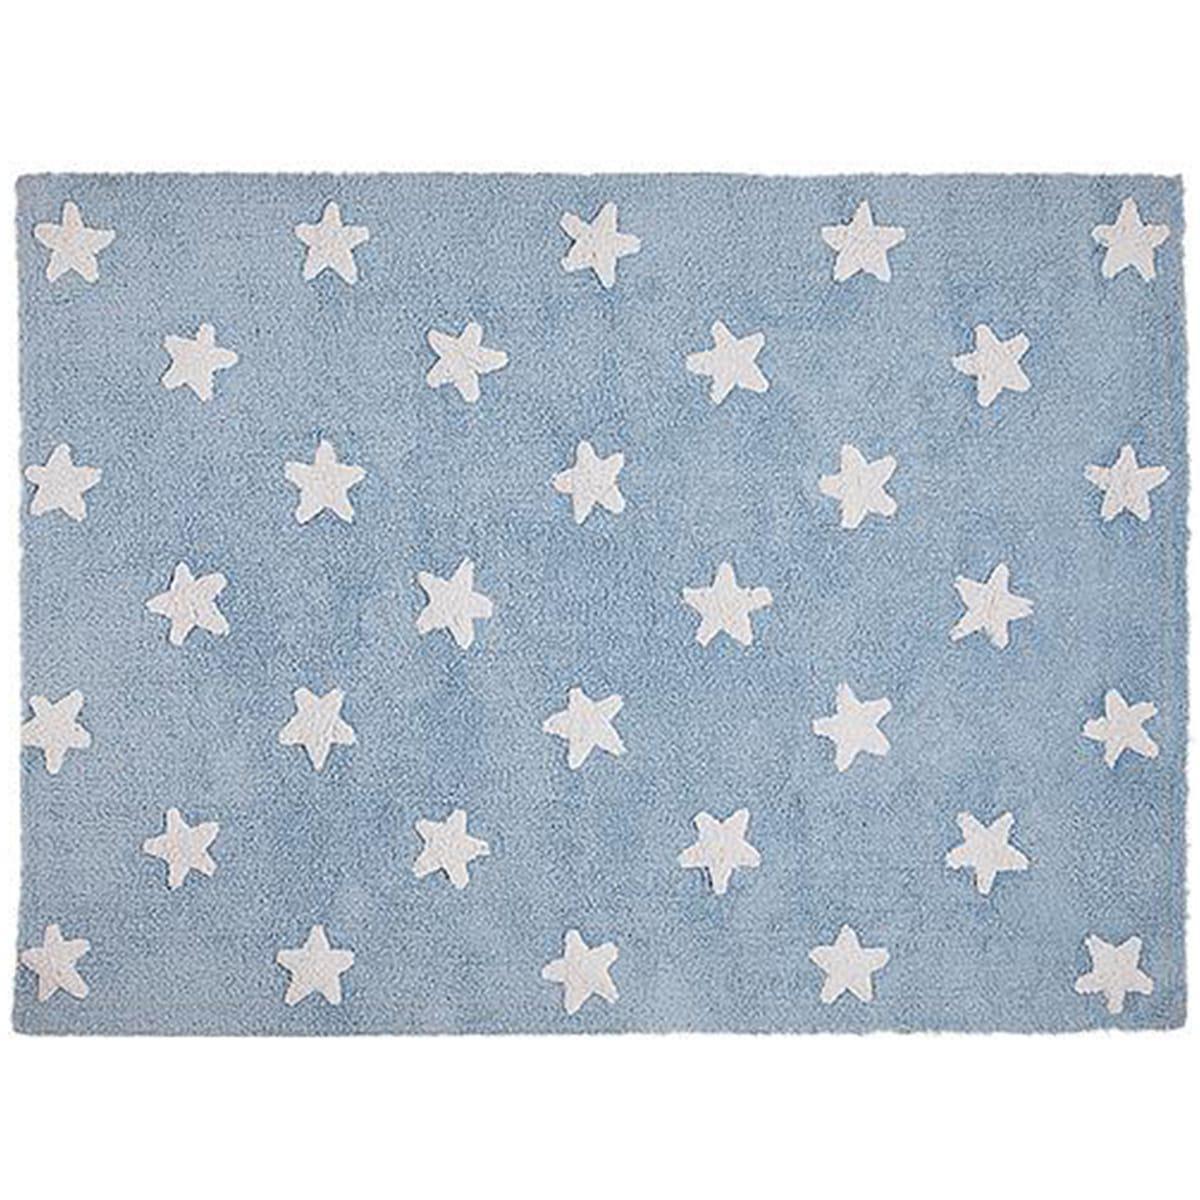 Alfombra 120x160cm STARS Lorena Canals blue-white